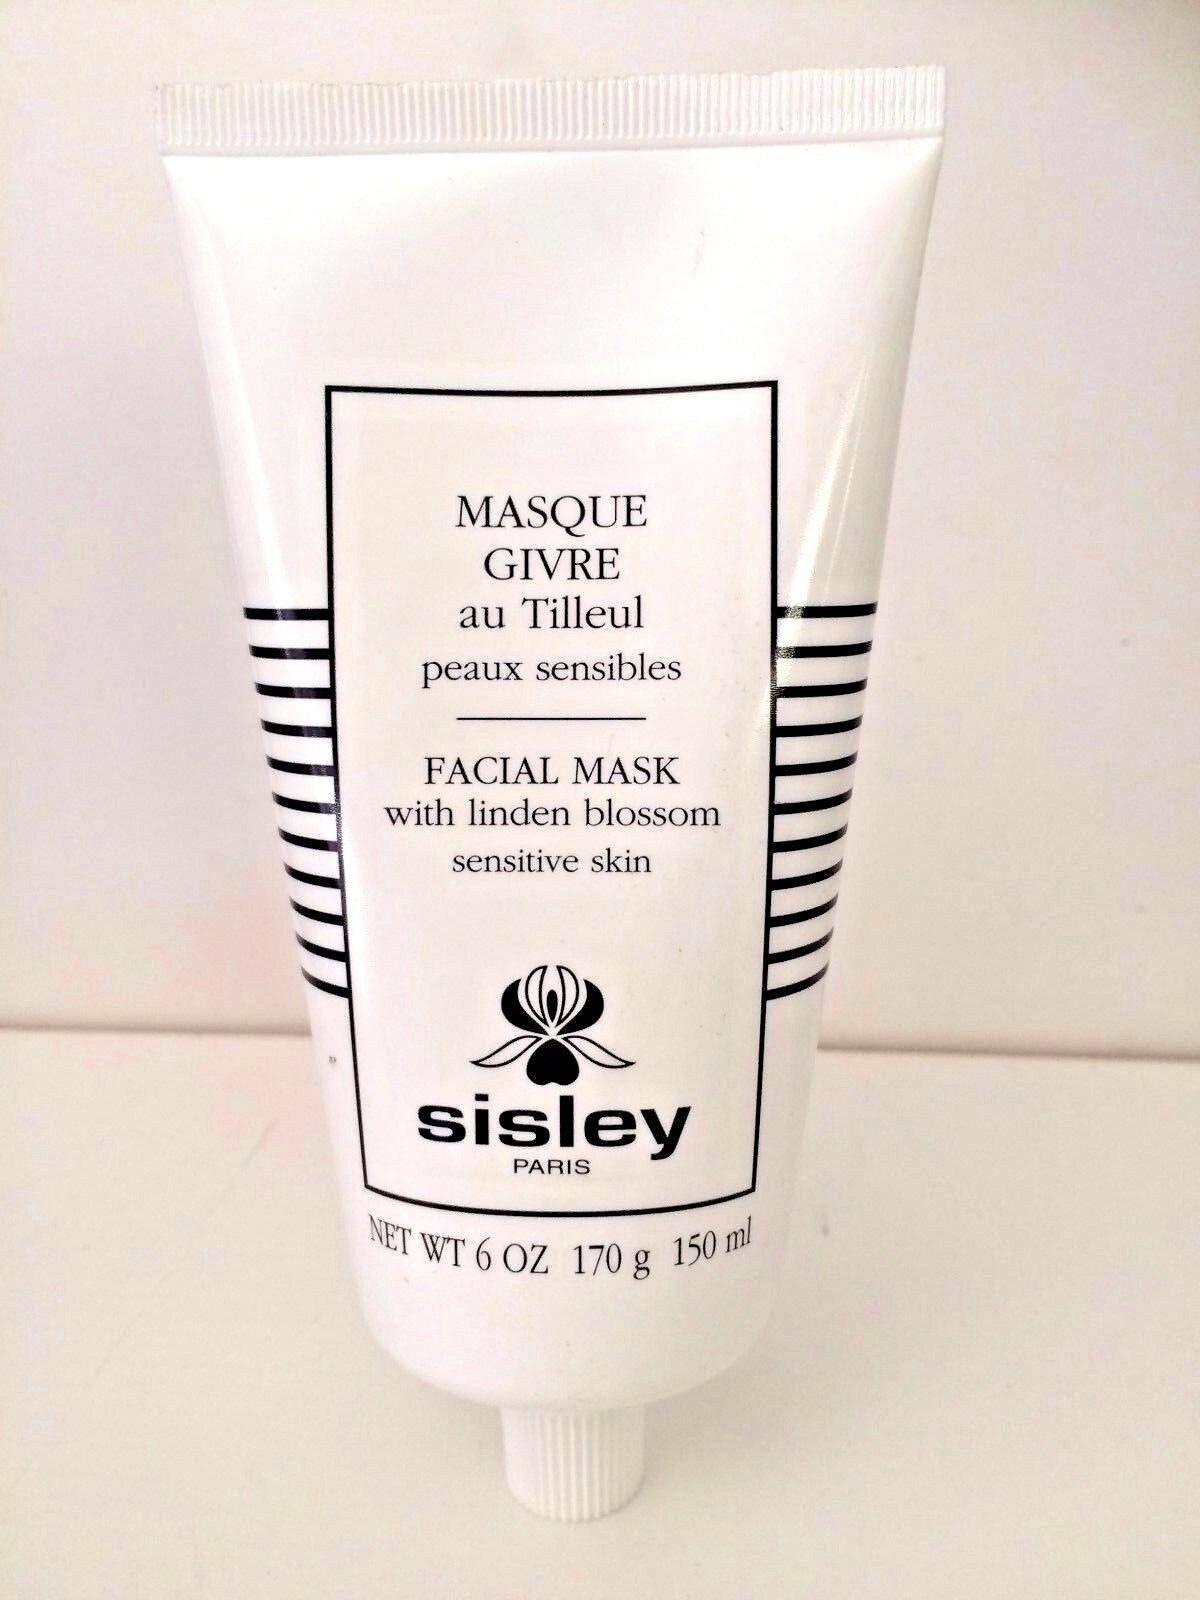 Sisley Facial Mask with linden blossom sensitive skin 6 oz